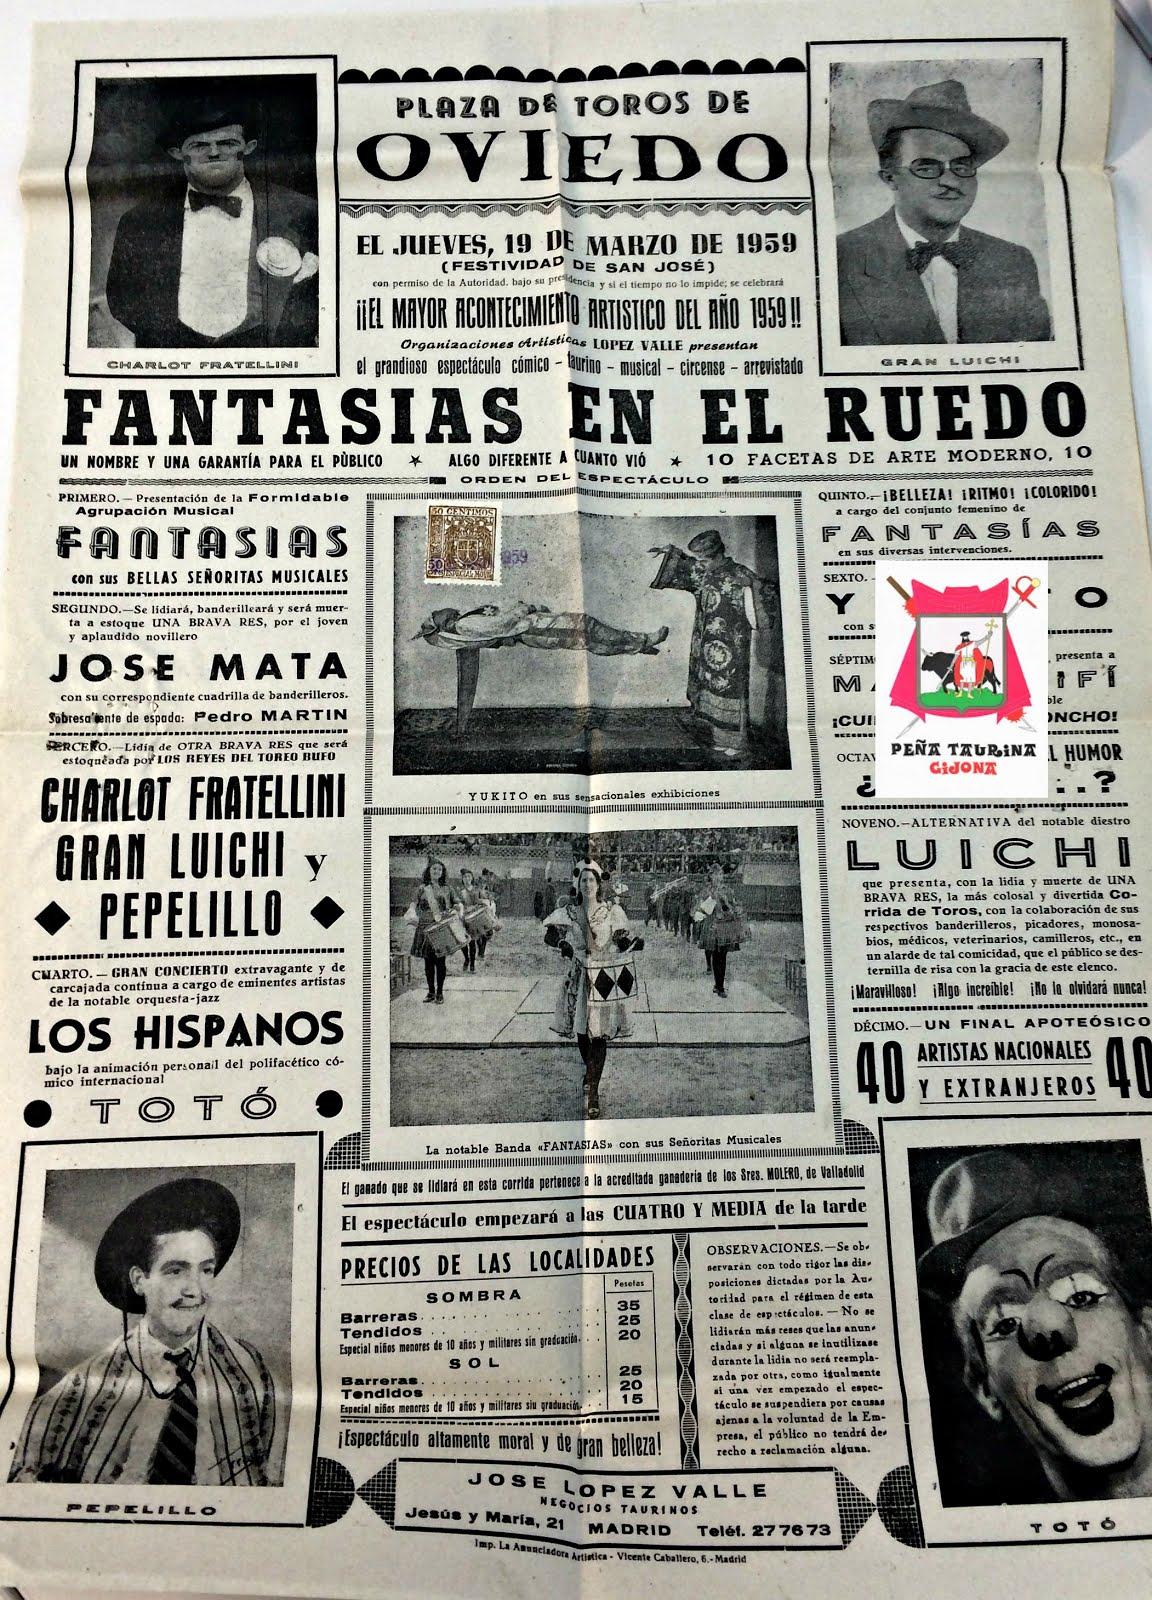 OVIEDO CARTEL DE TOROS